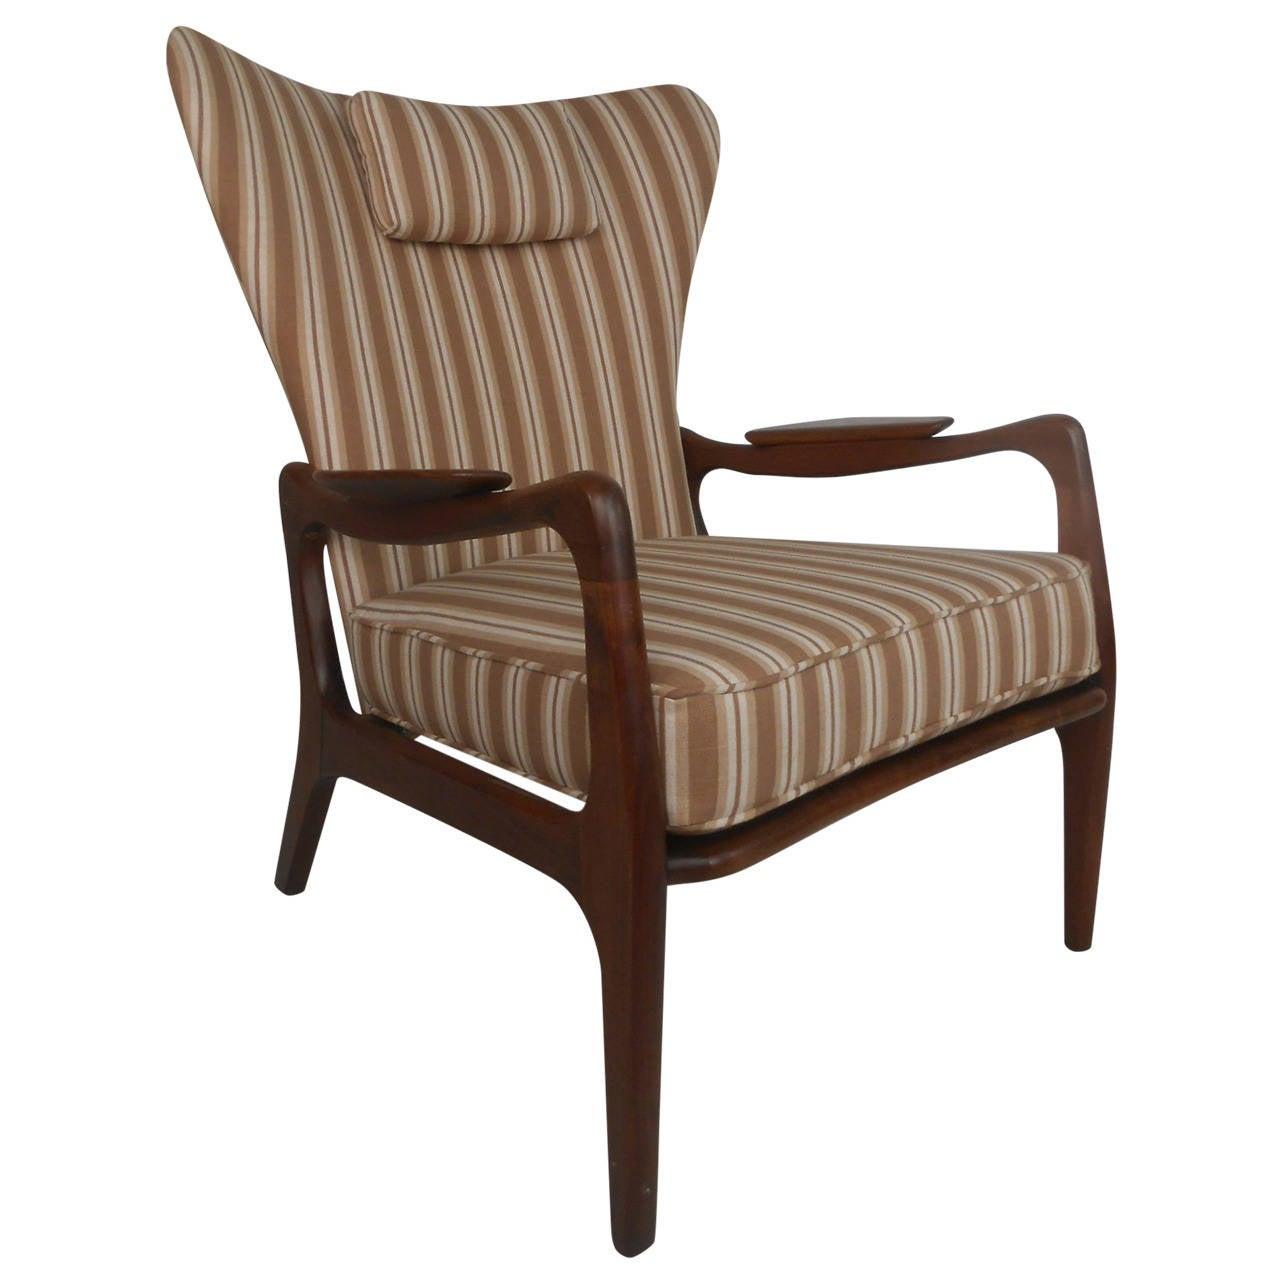 1960s Missoni Wingback Chair At 1stdibs: Adrian Pearsall Wingback Lounge Chair At 1stdibs